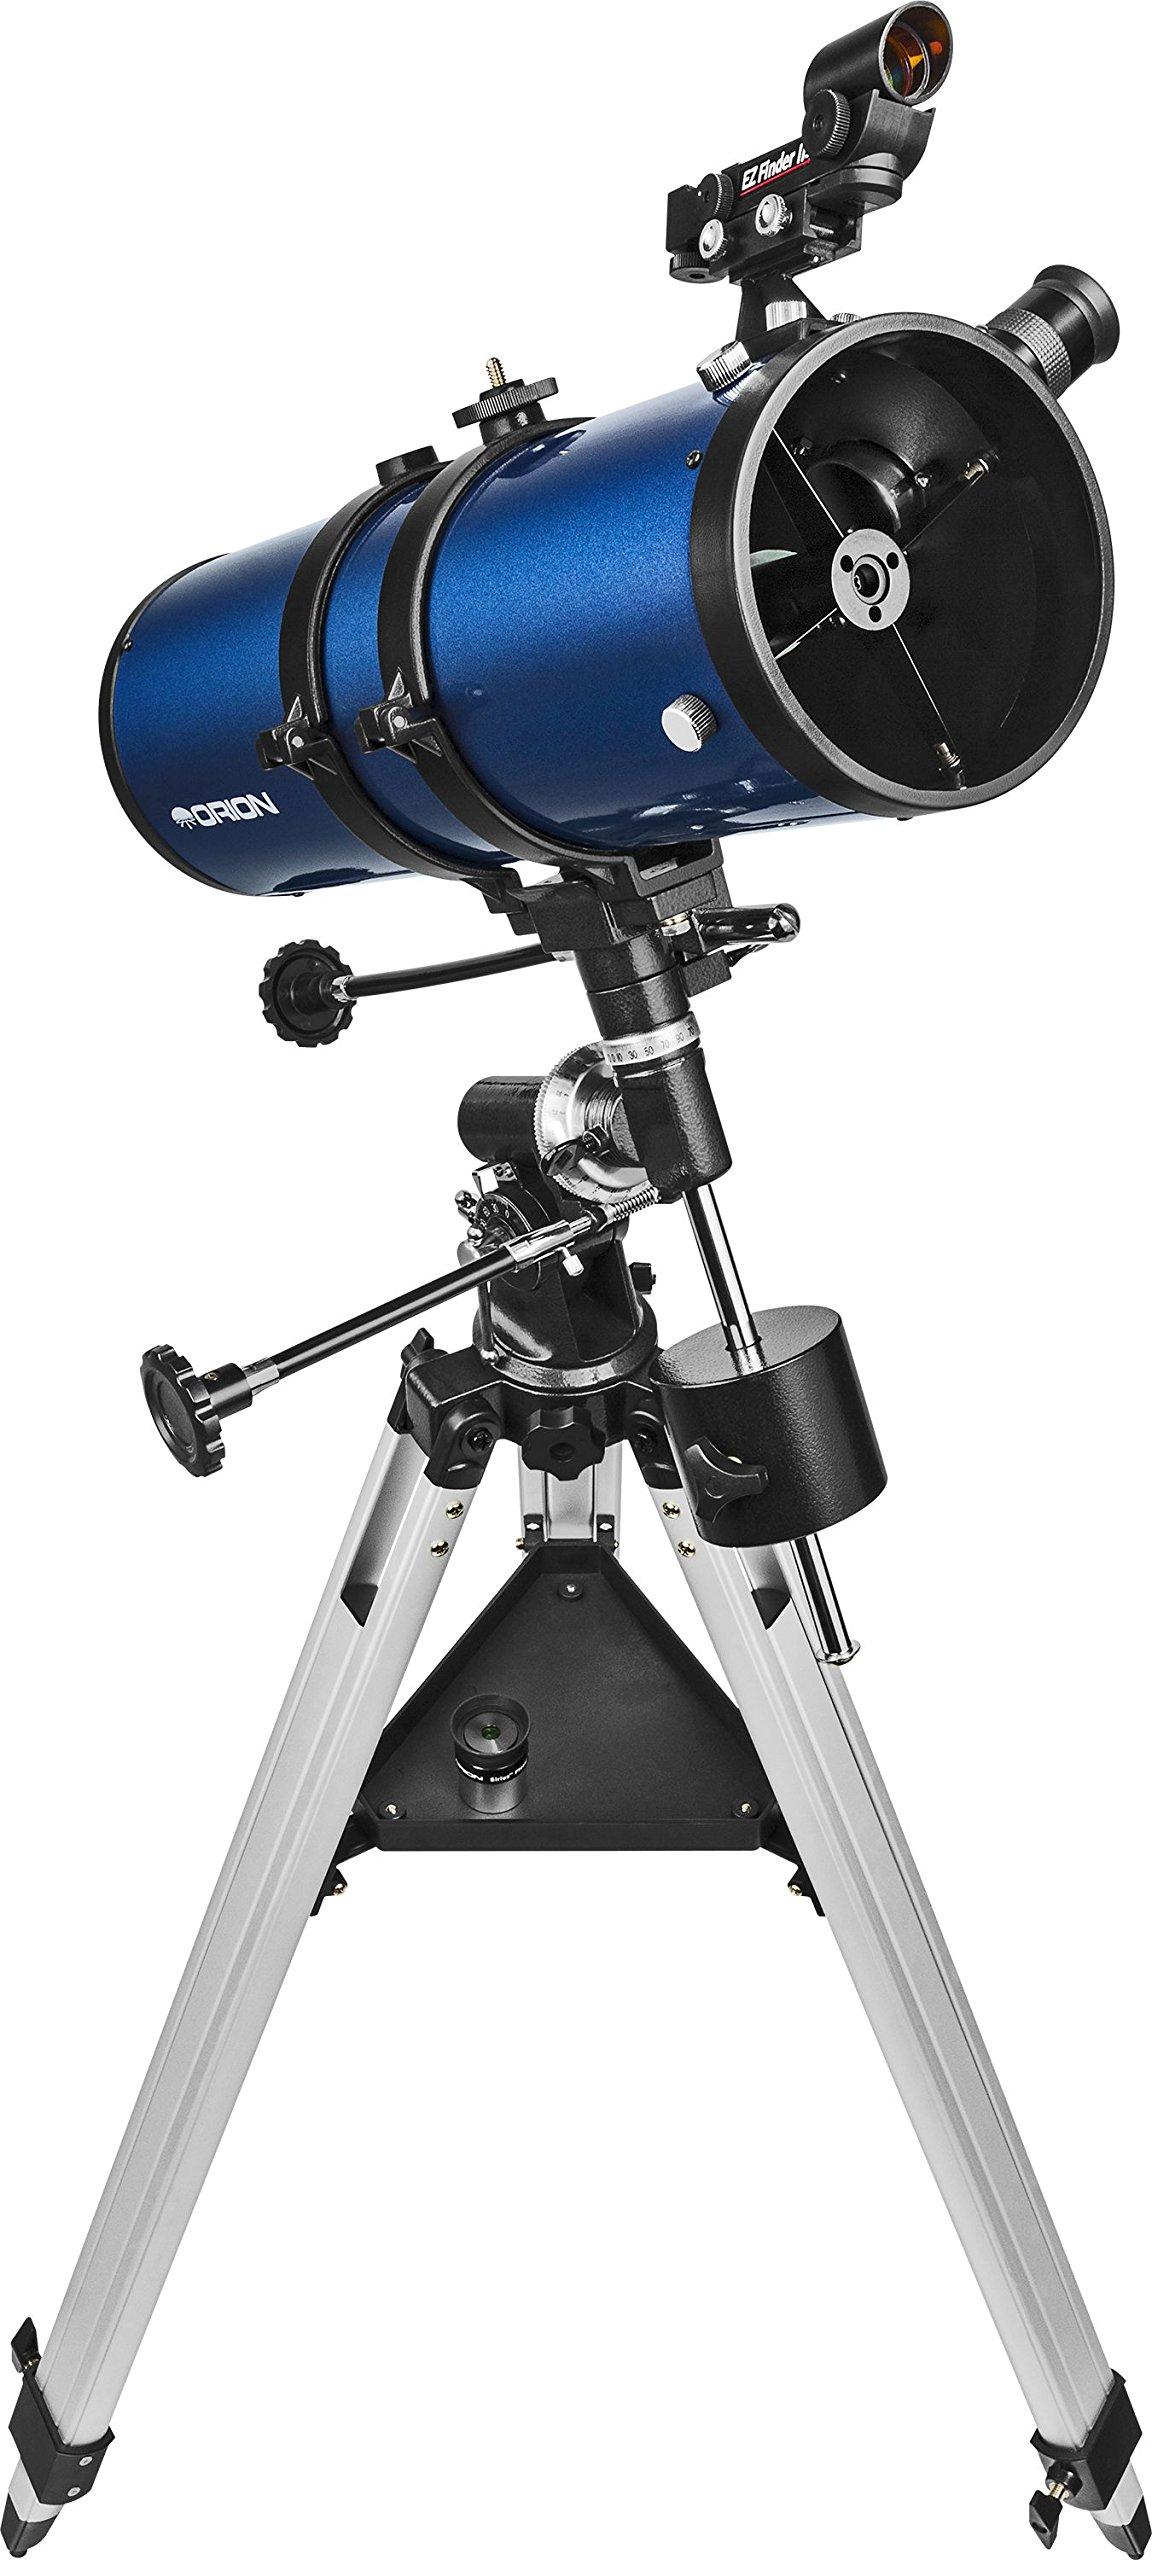 Orion StarBlast II 4.5 Equatorial Reflector Telescope